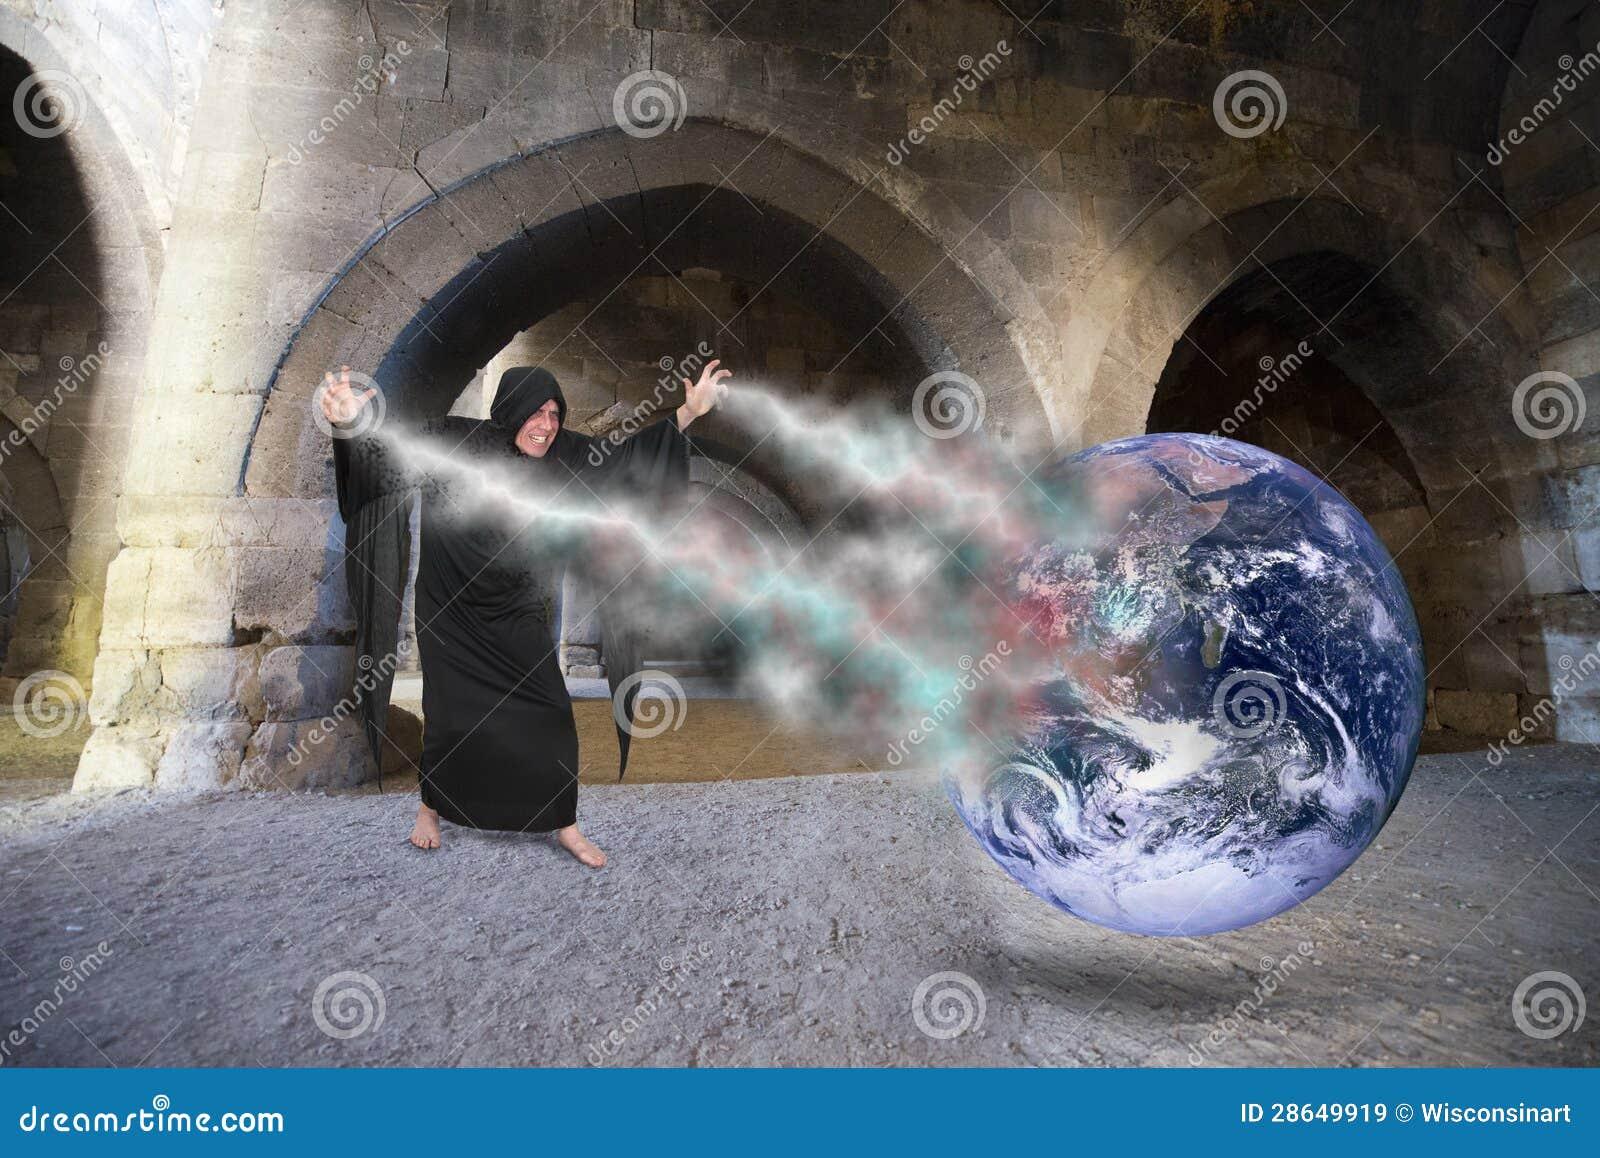 Evil Wizard Cast Spell, Creates World Apocalypse, Doomsday